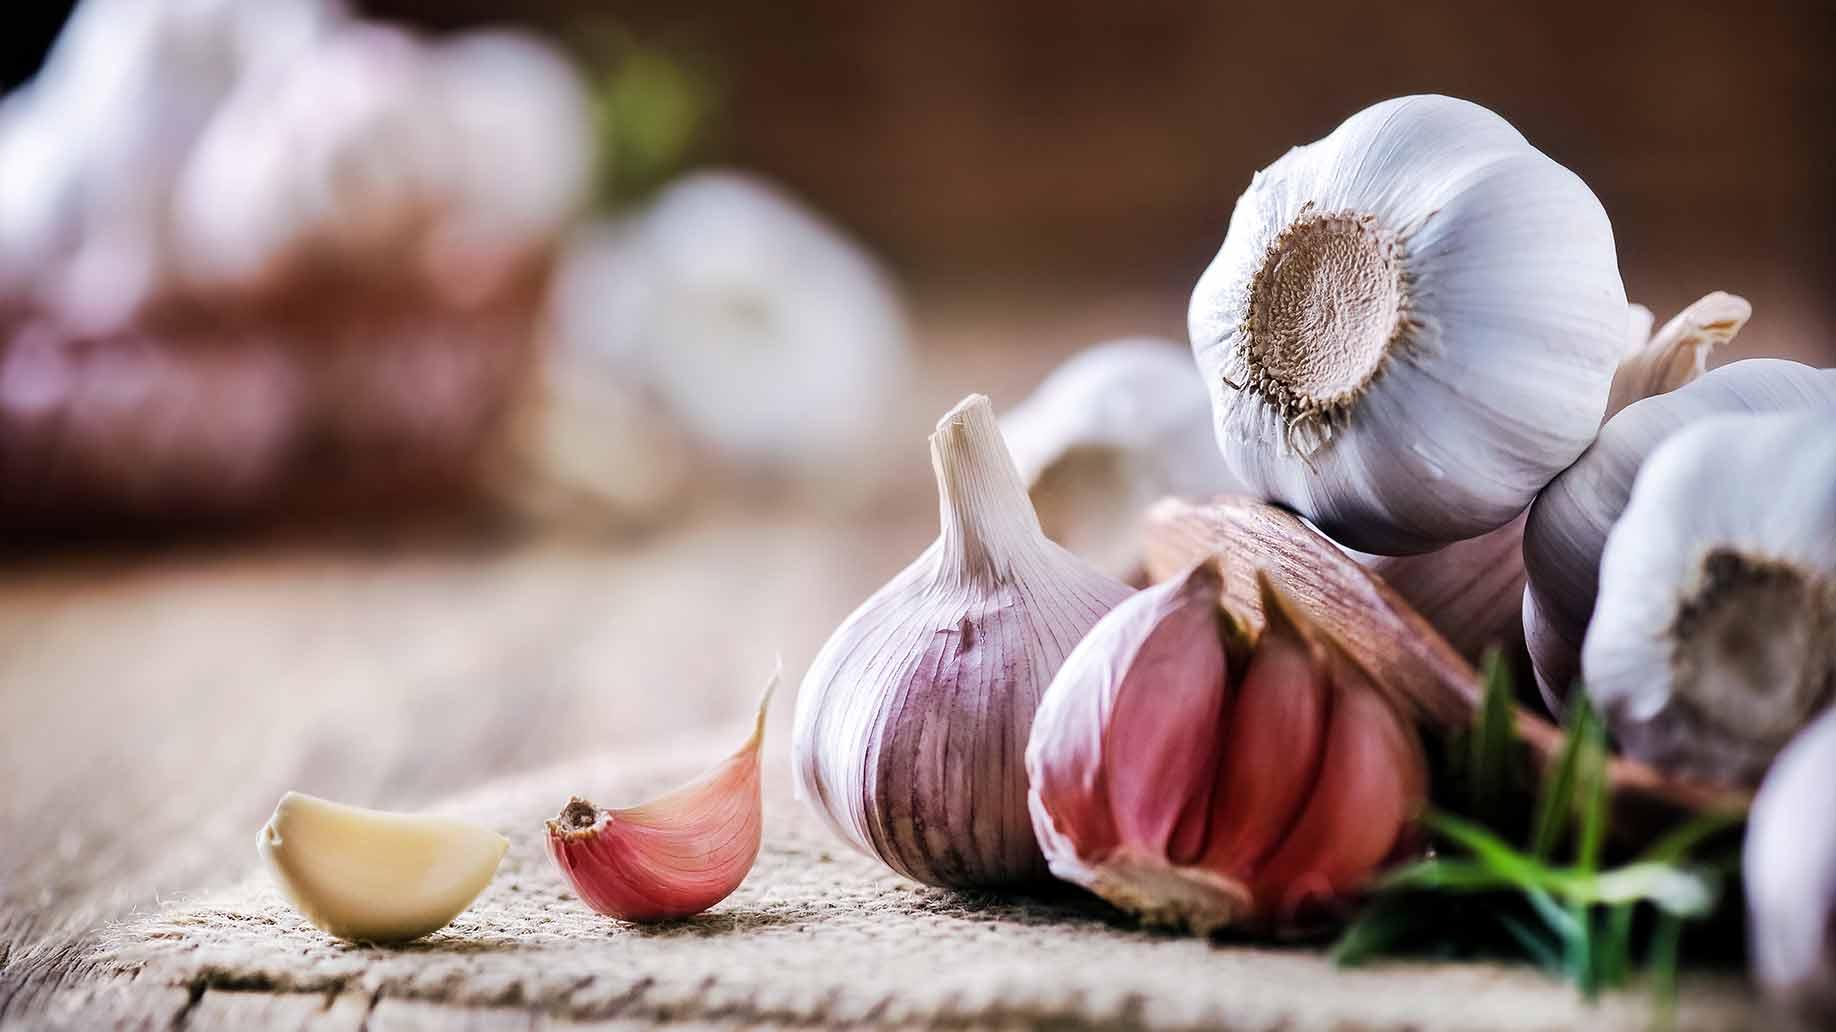 high cholesterol garlic cloves heart health natural remedies